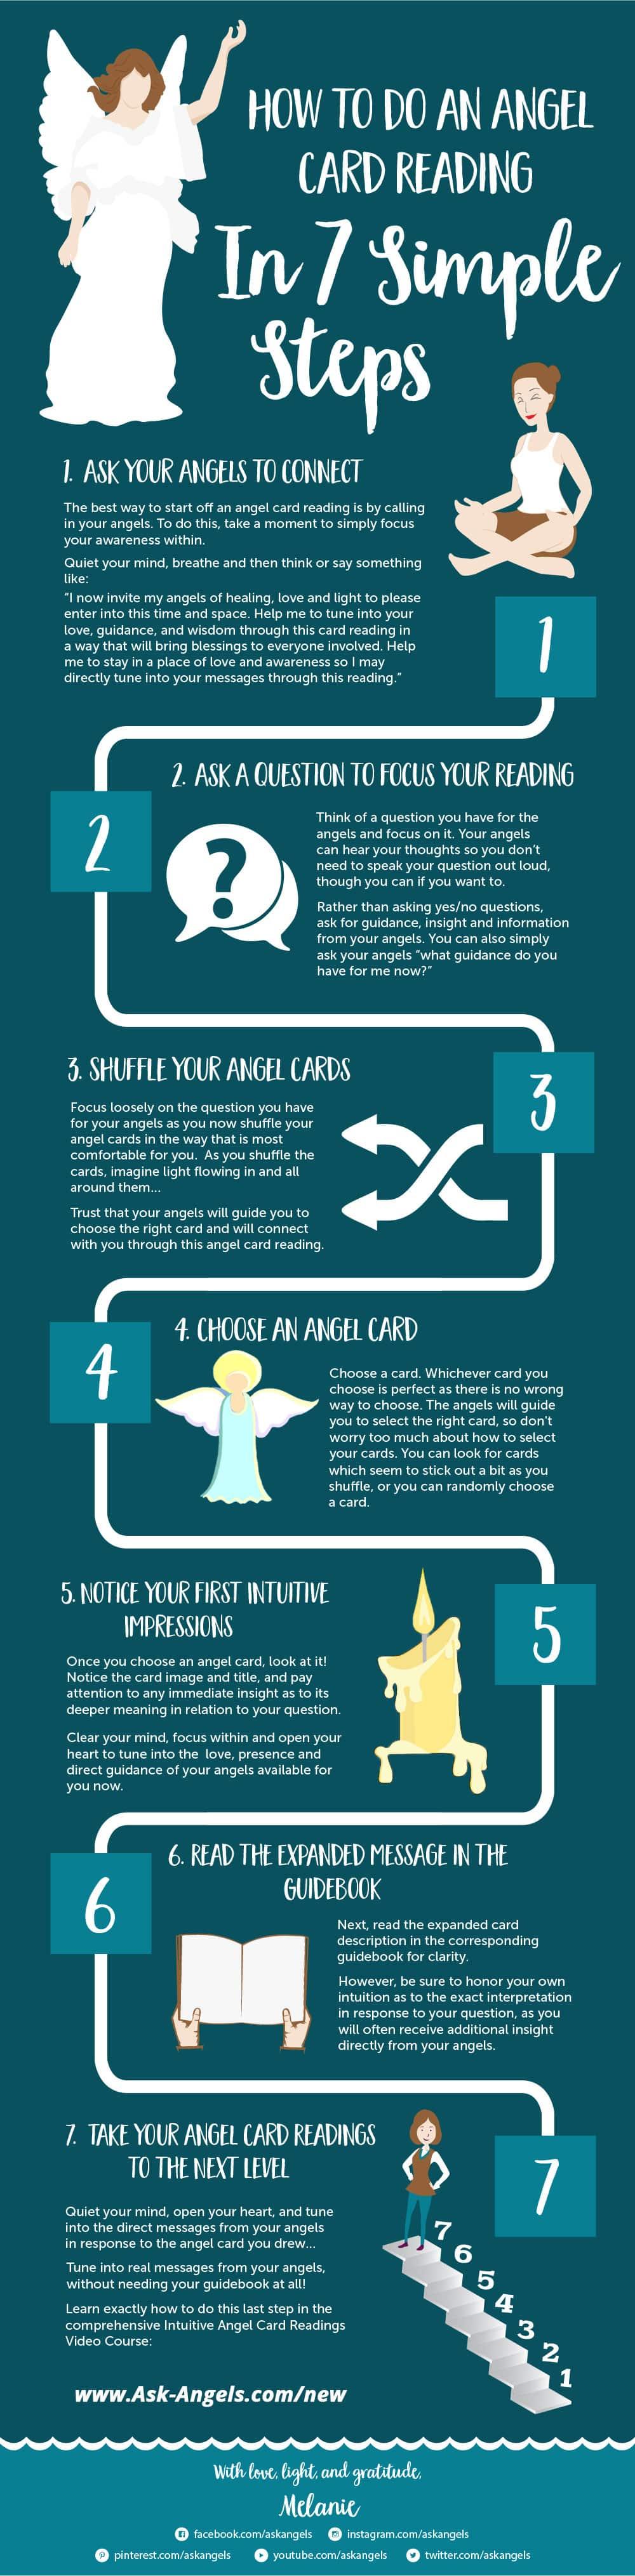 Angel-Card-Reading-7-Simple-Steps